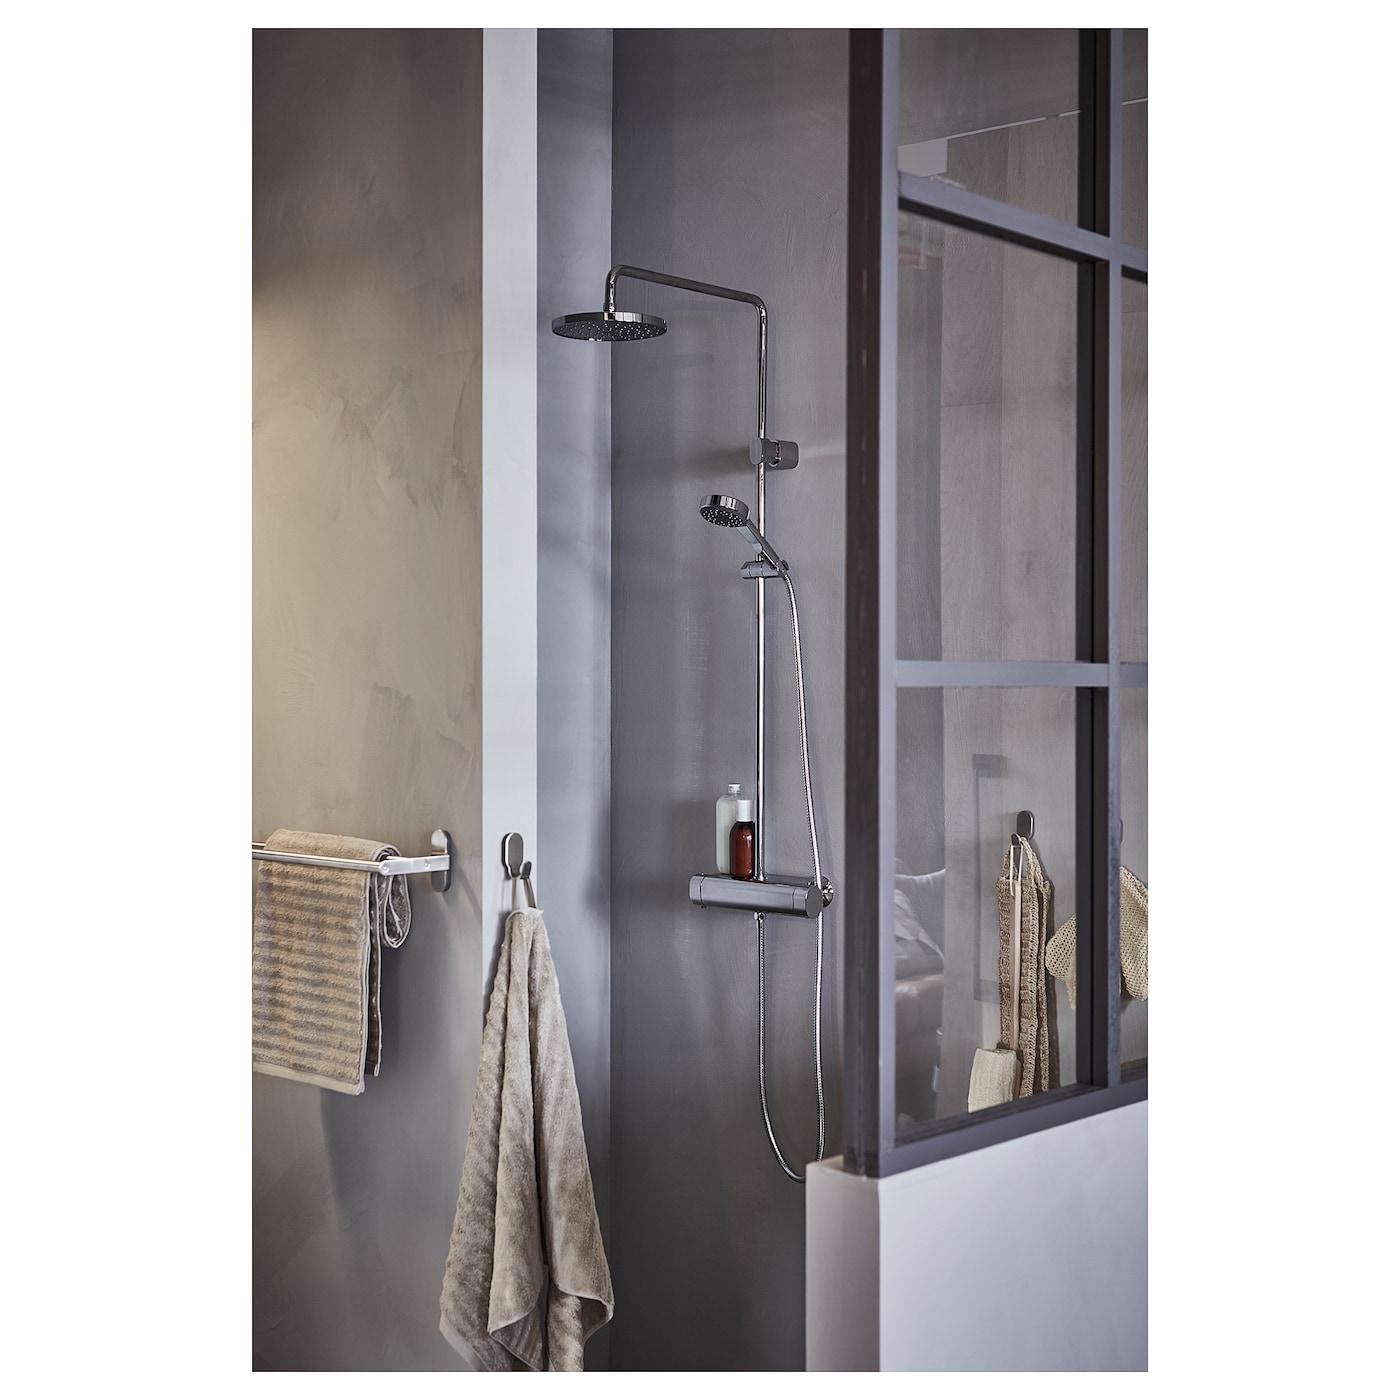 BROGRUND towel rail stainless steel 67 cm